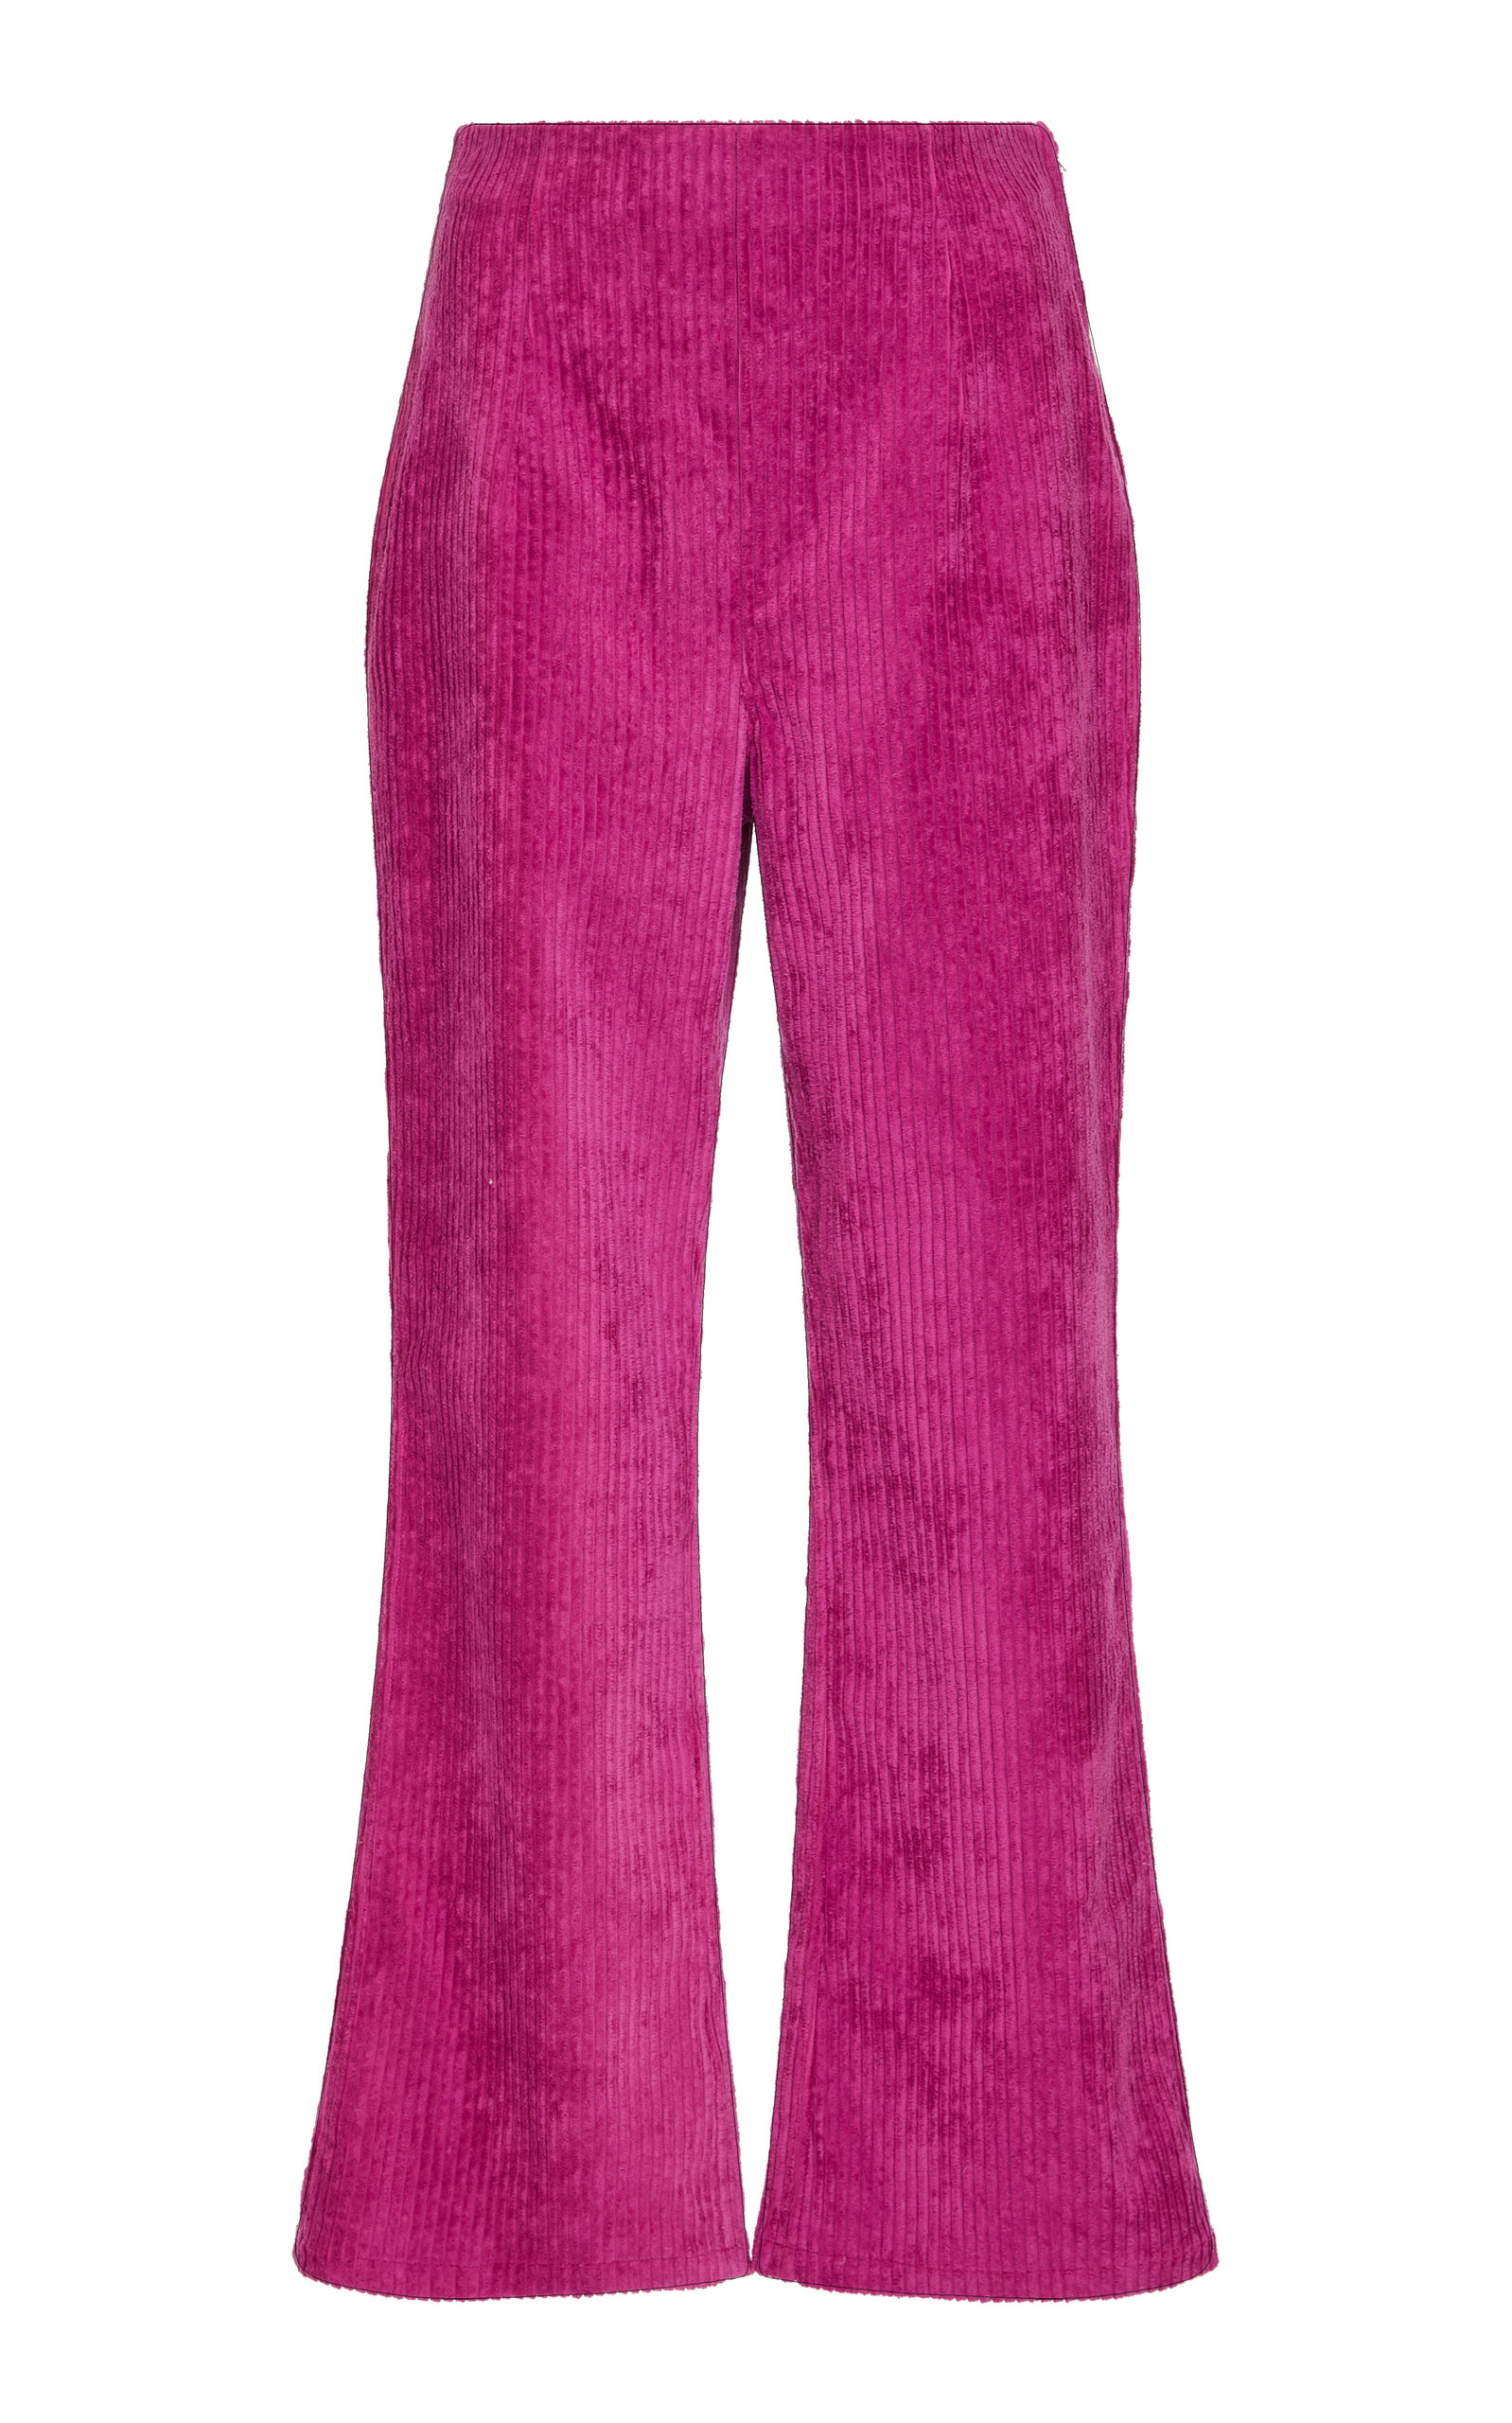 MARA HOFFMAN LUCY HIGH-WAISTED FLARED CORDUROY PANTS